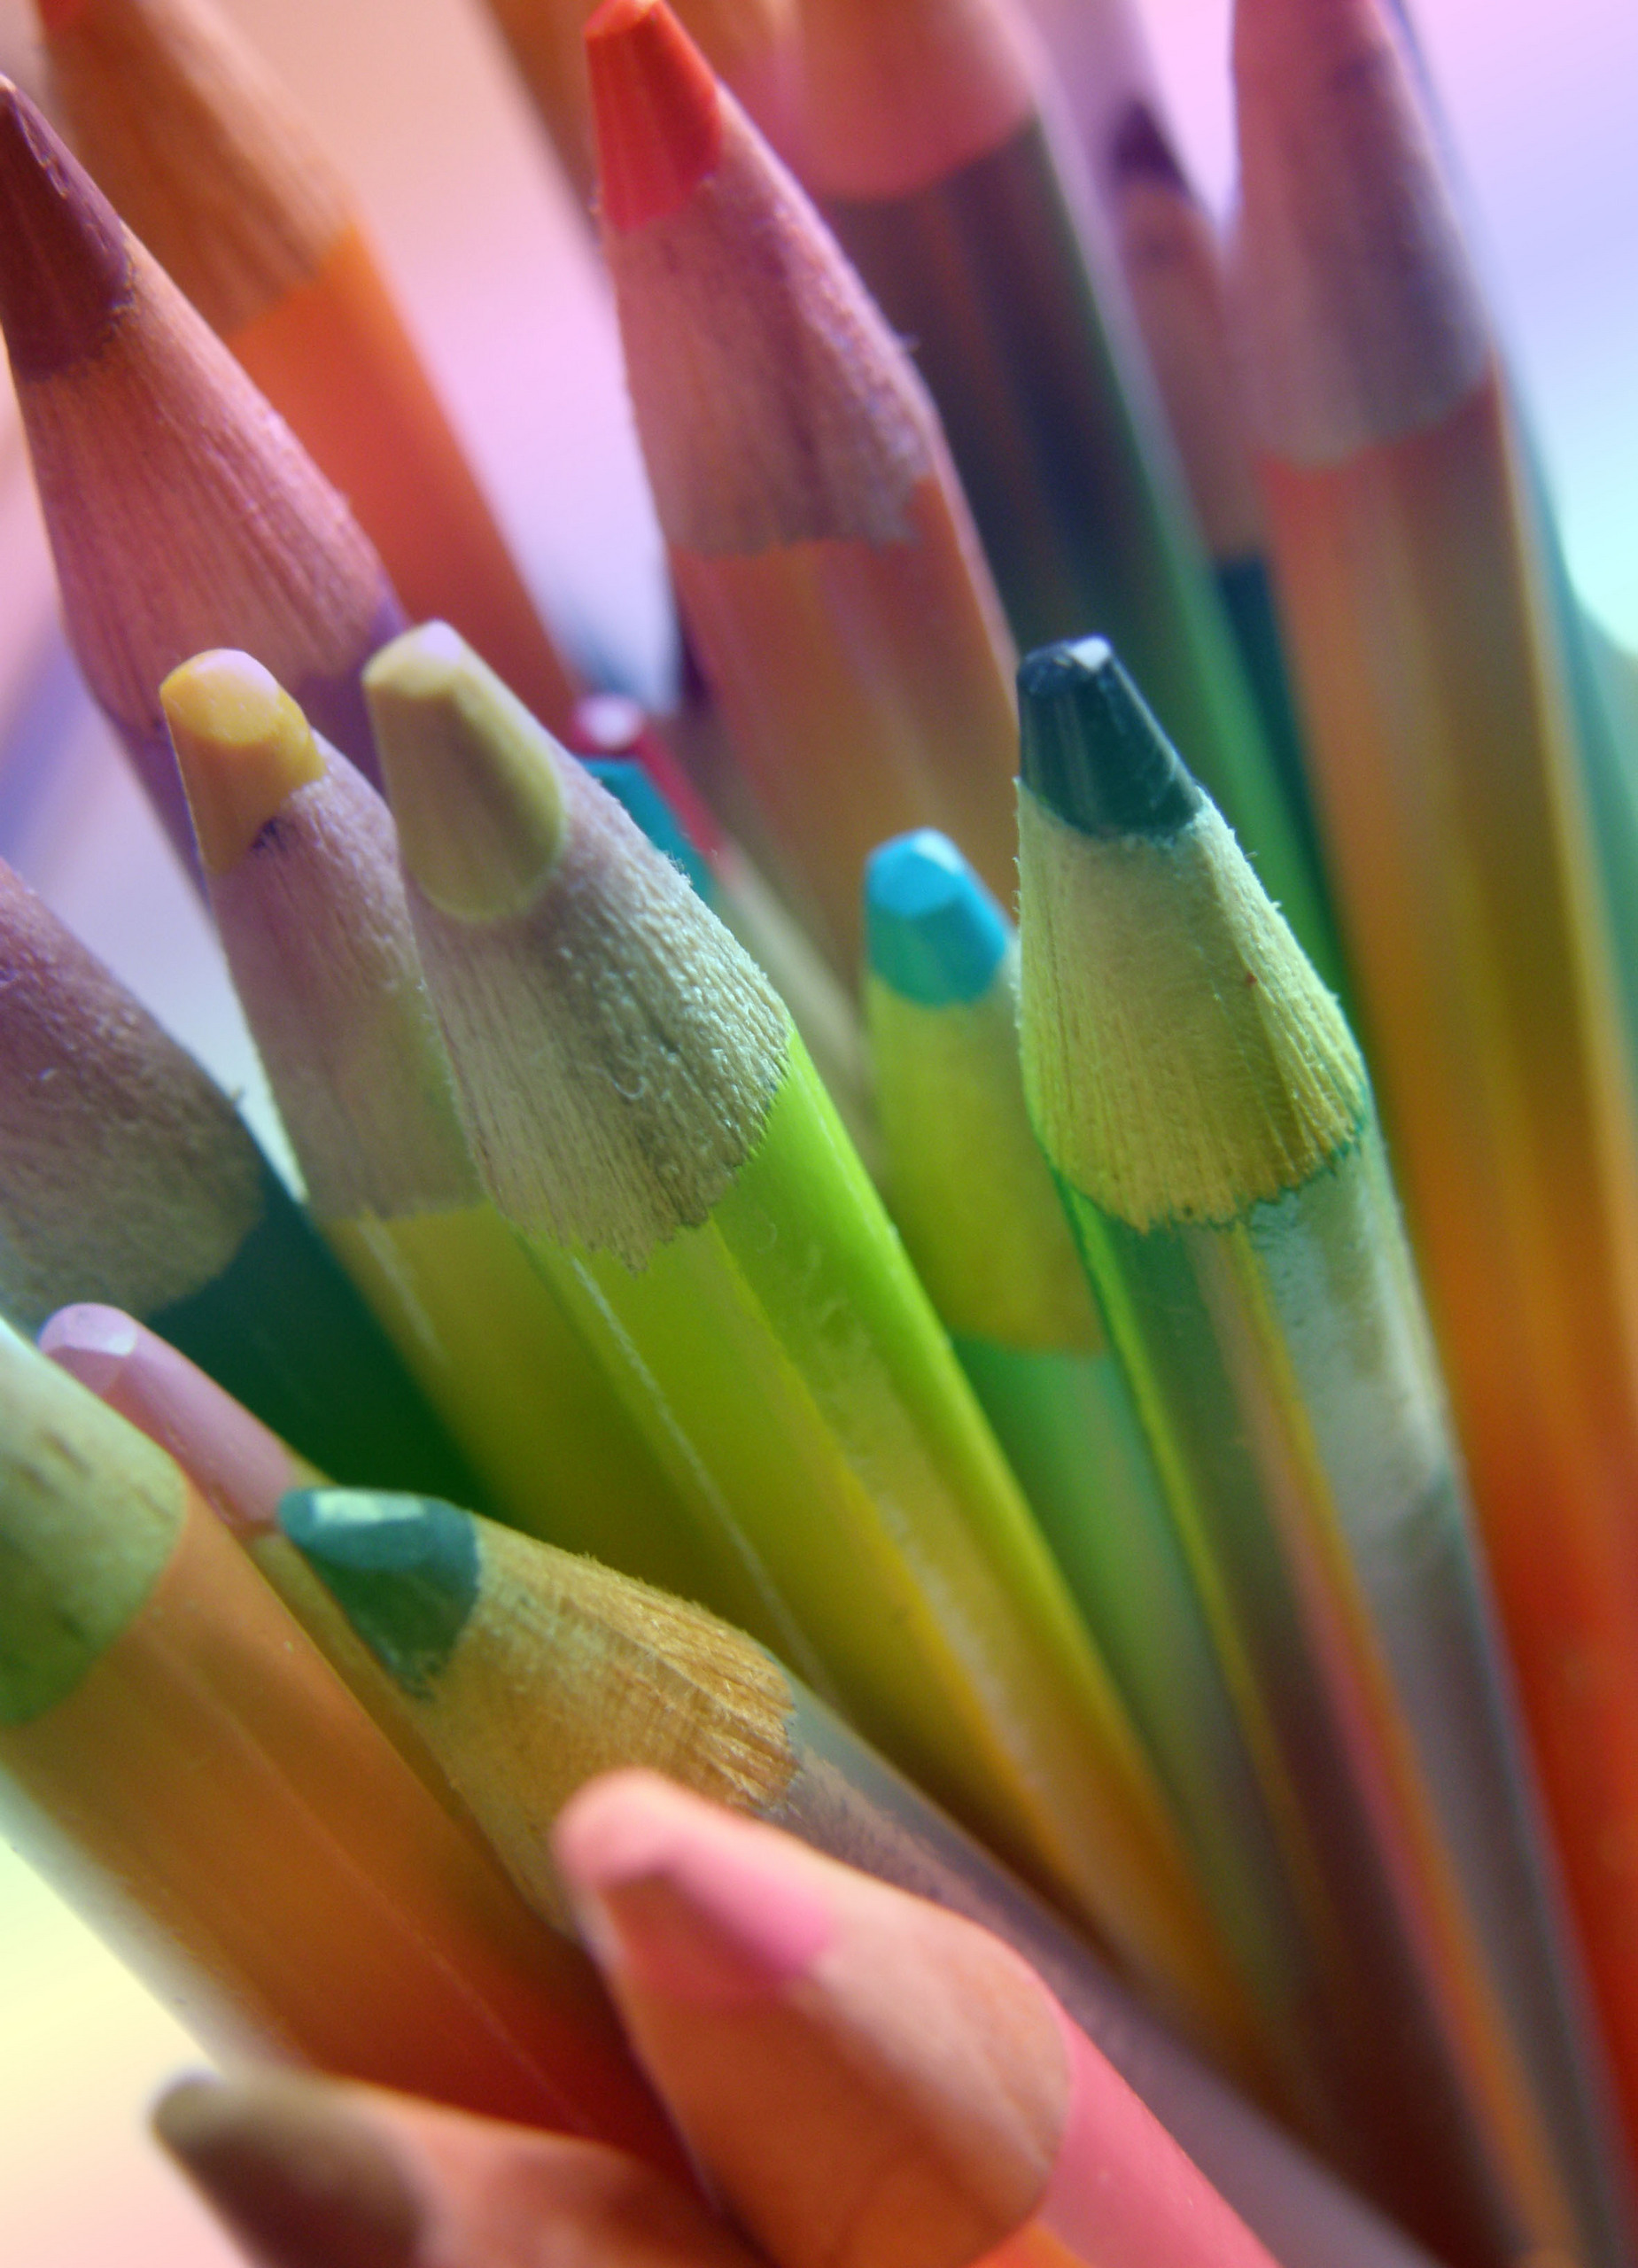 colored pencils - Pencils Photo (13251640) - Fanpop